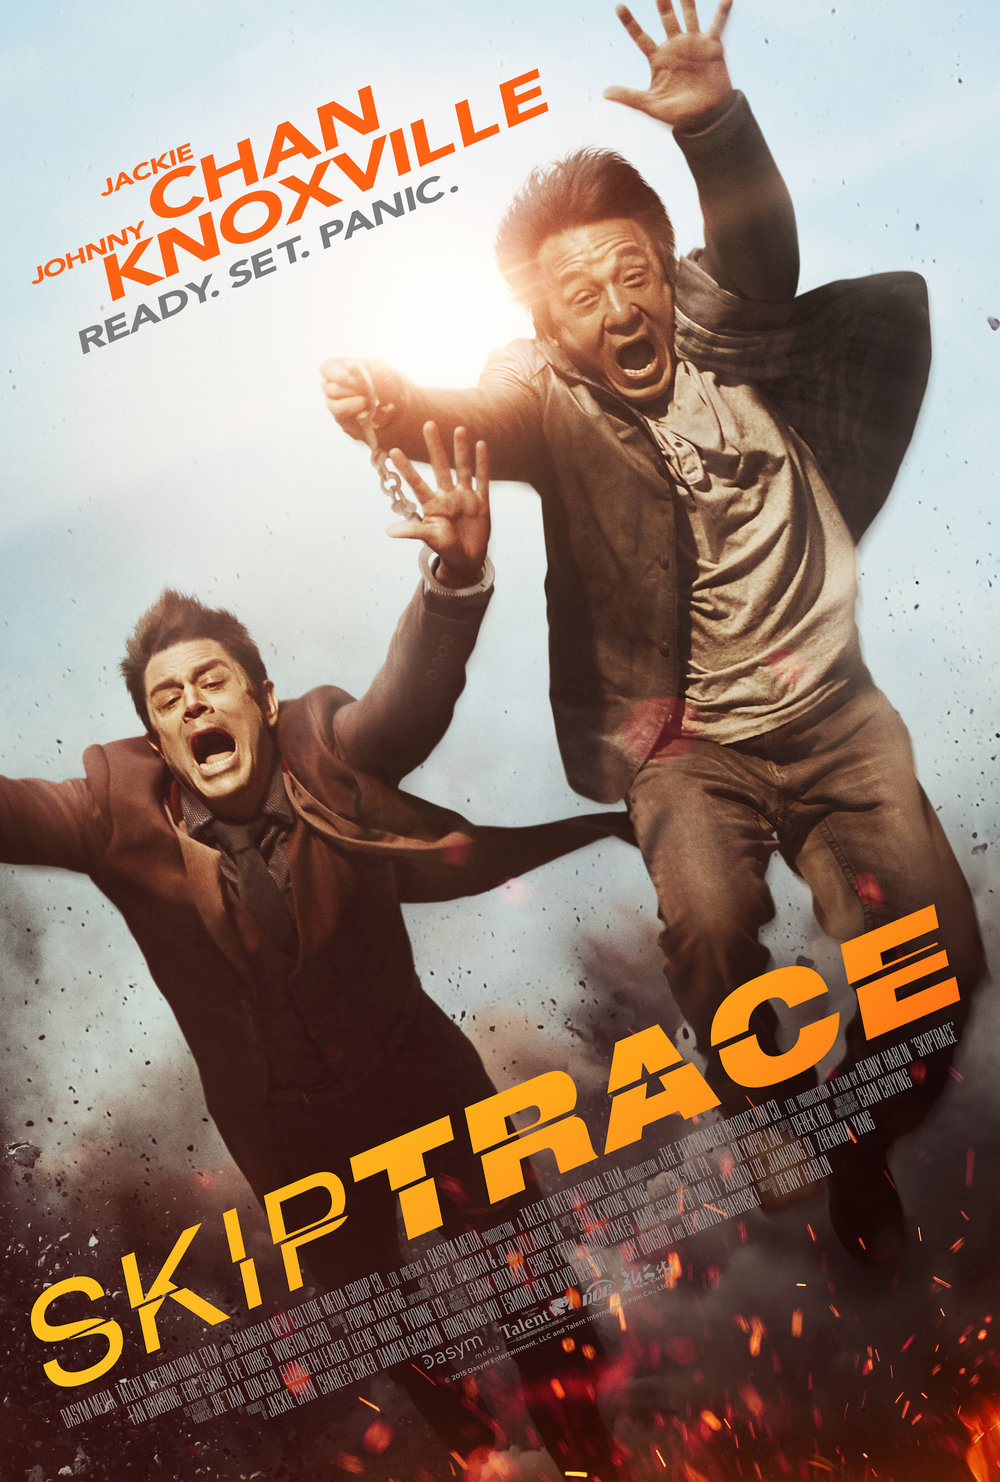 SKIPTRACE  (2014)  Dir. Renny Harlin